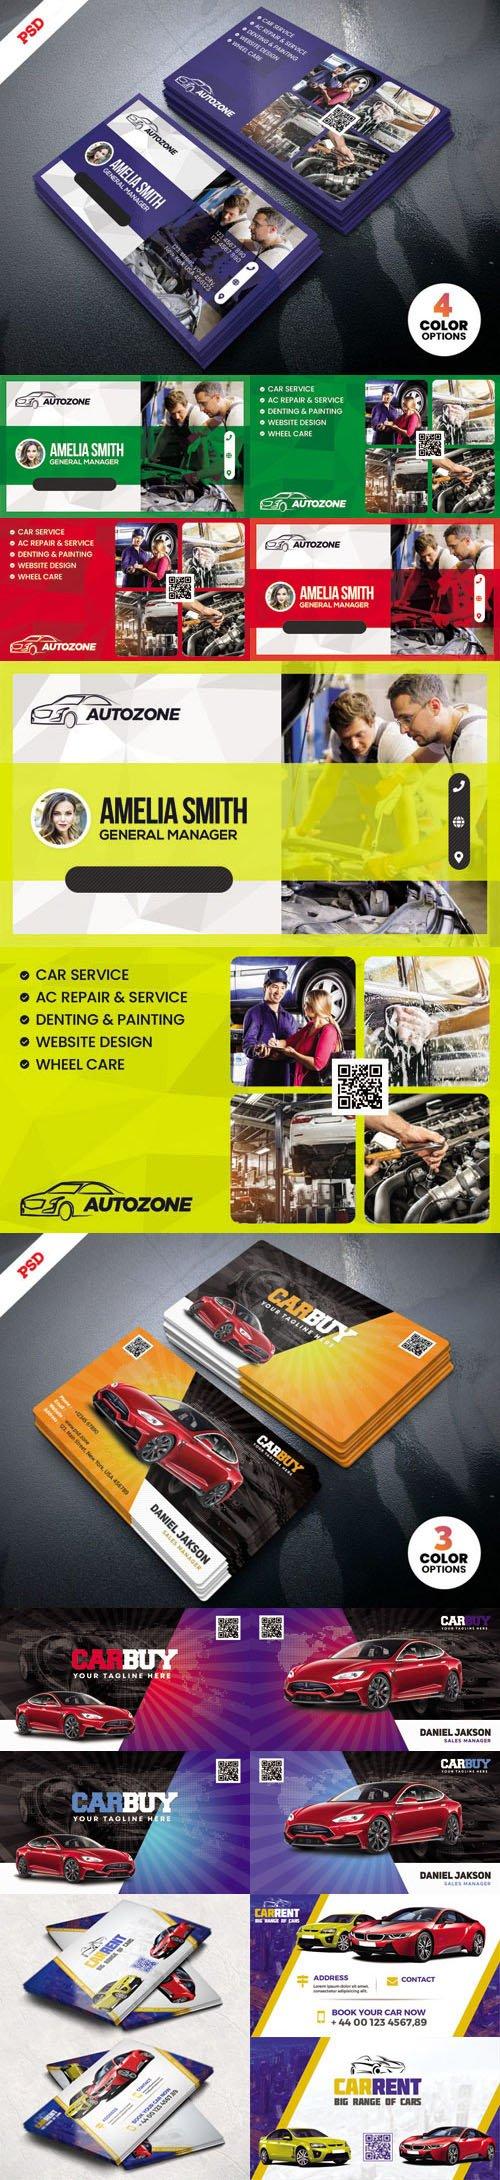 Car Repair Shop & Car Dealer Business Cards Colllection in PSD